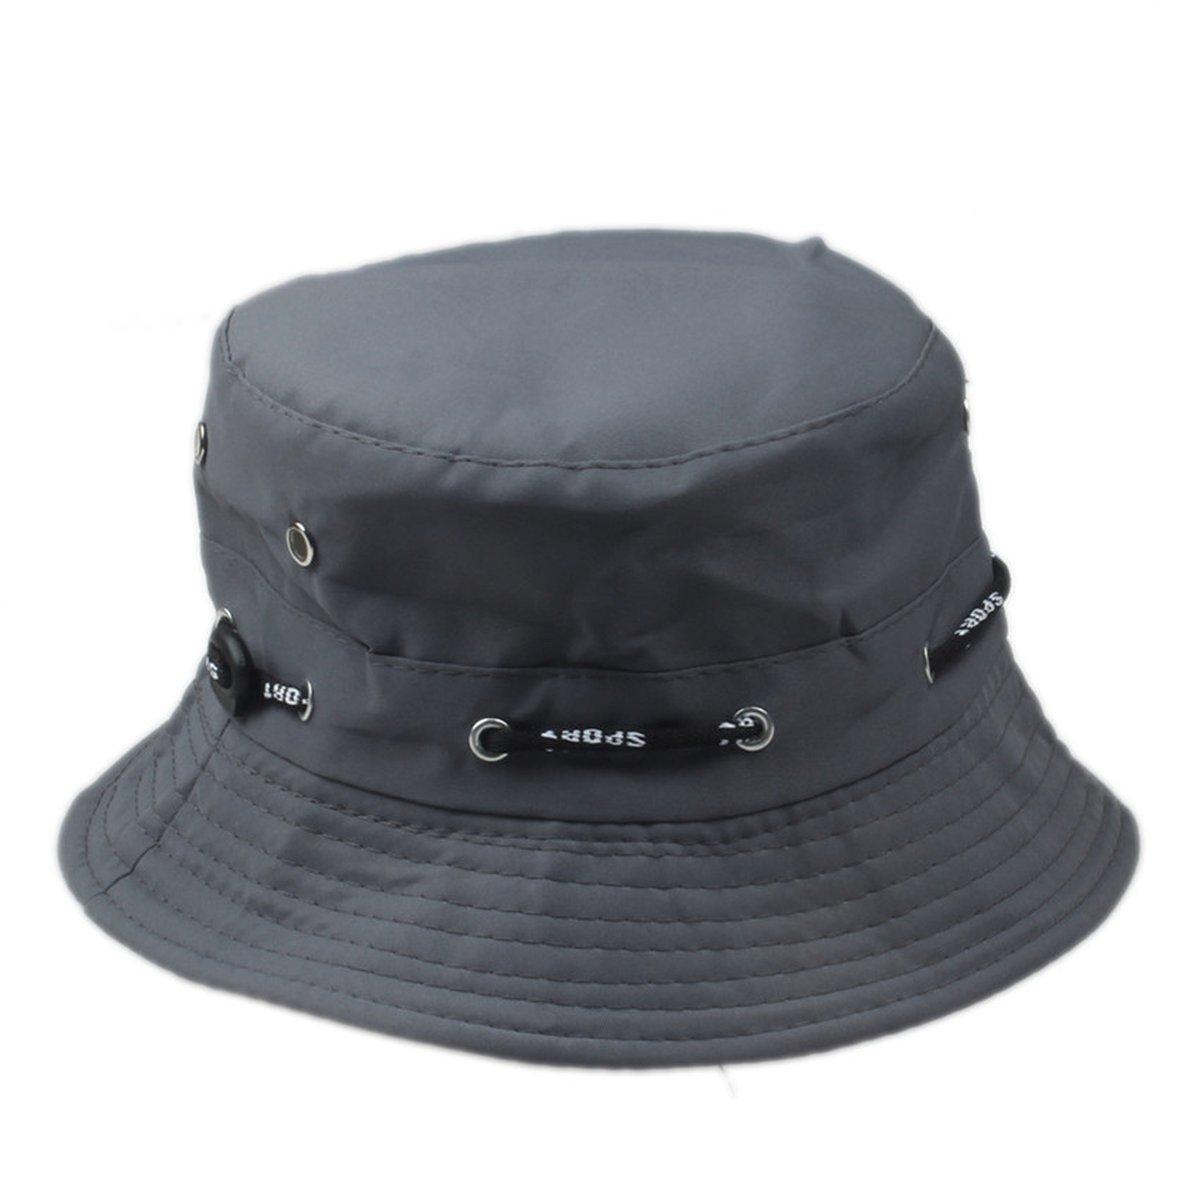 4c92aafd02c Bucket Hat for Men Panama Women Fishing Sun Hat Anti-UV Sun Block Visor at  Amazon Women s Clothing store